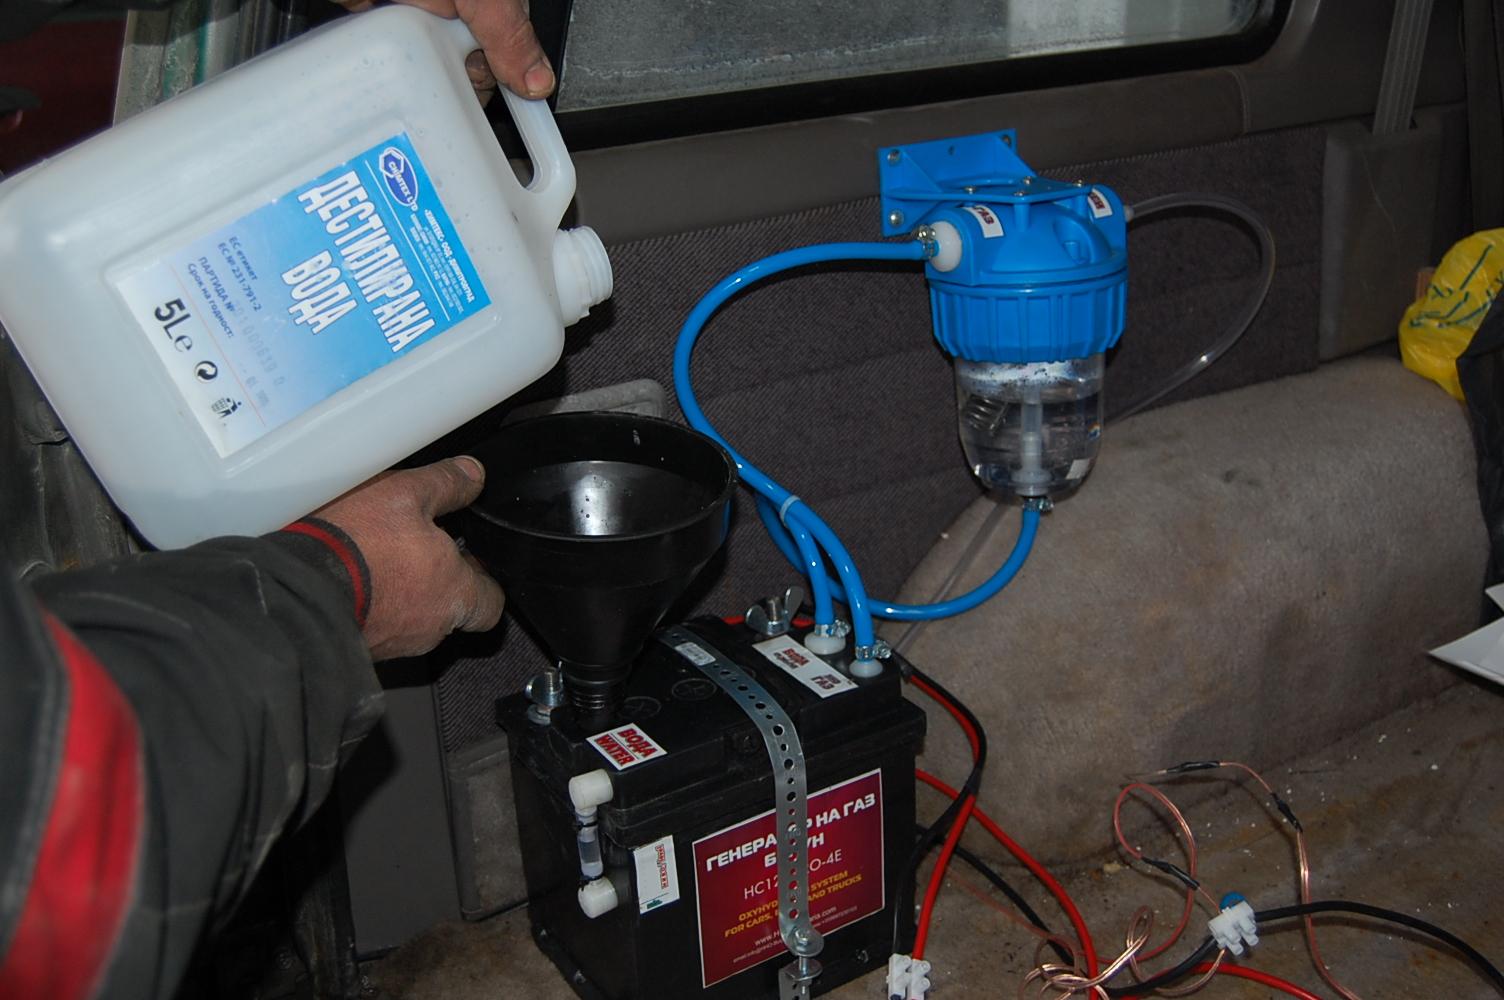 Готови сме монтажа на водородния генератор